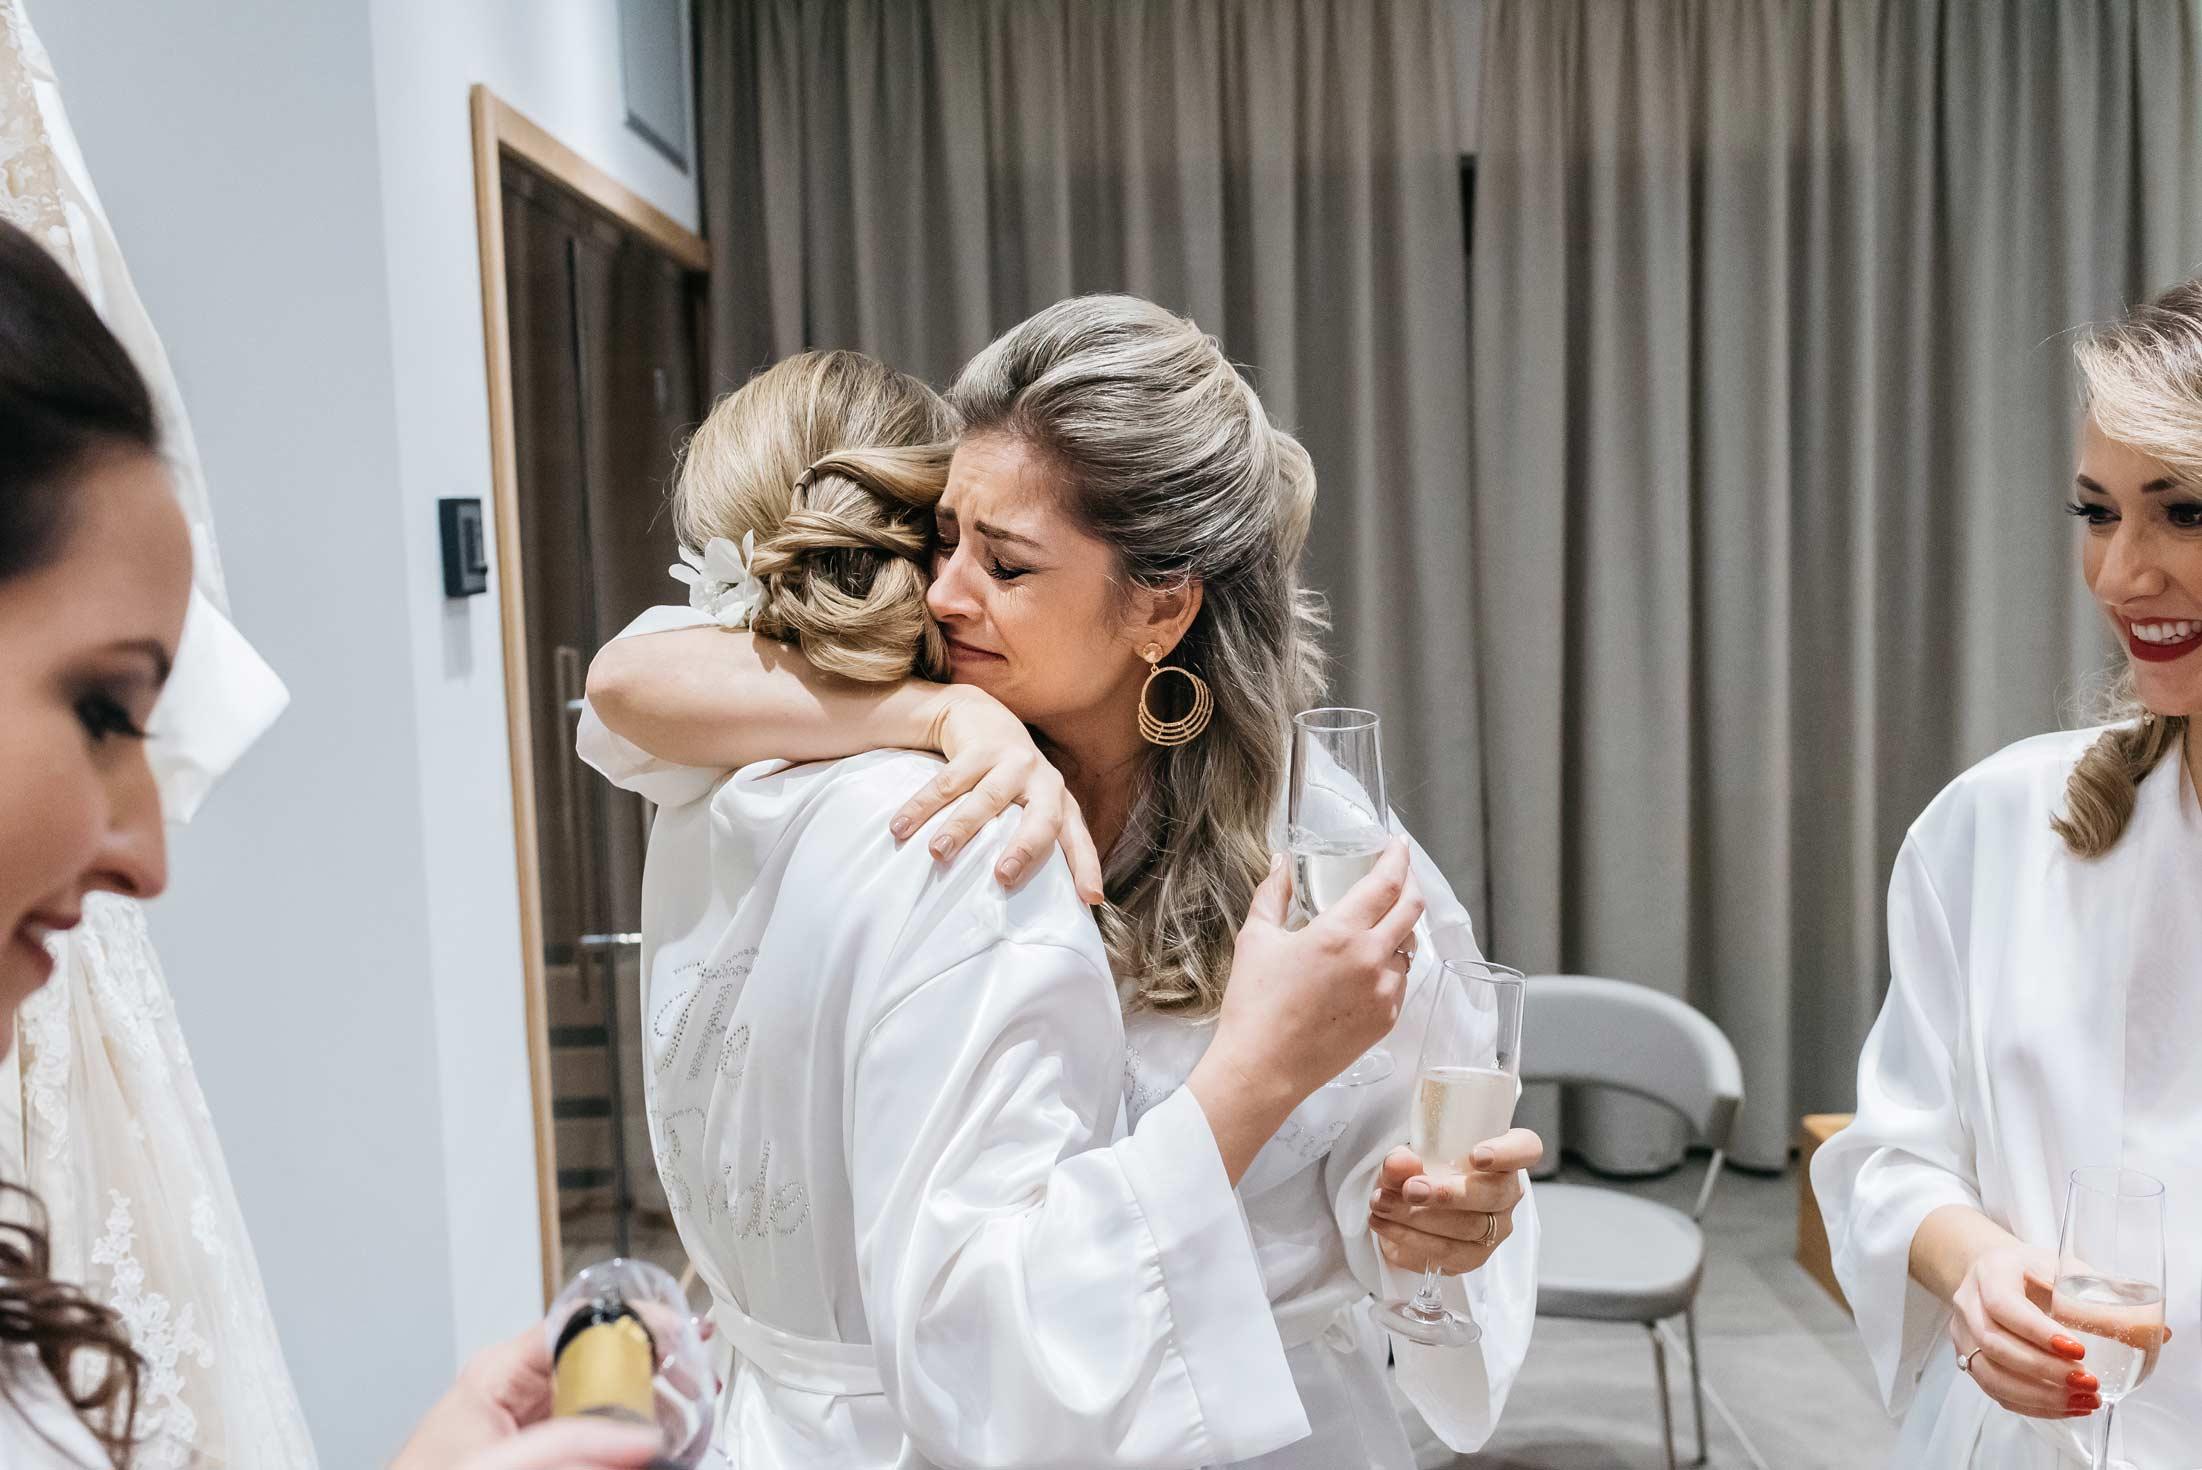 Fotografo-Stile-Reportage-Matrimonio-Preparativi-Sposa